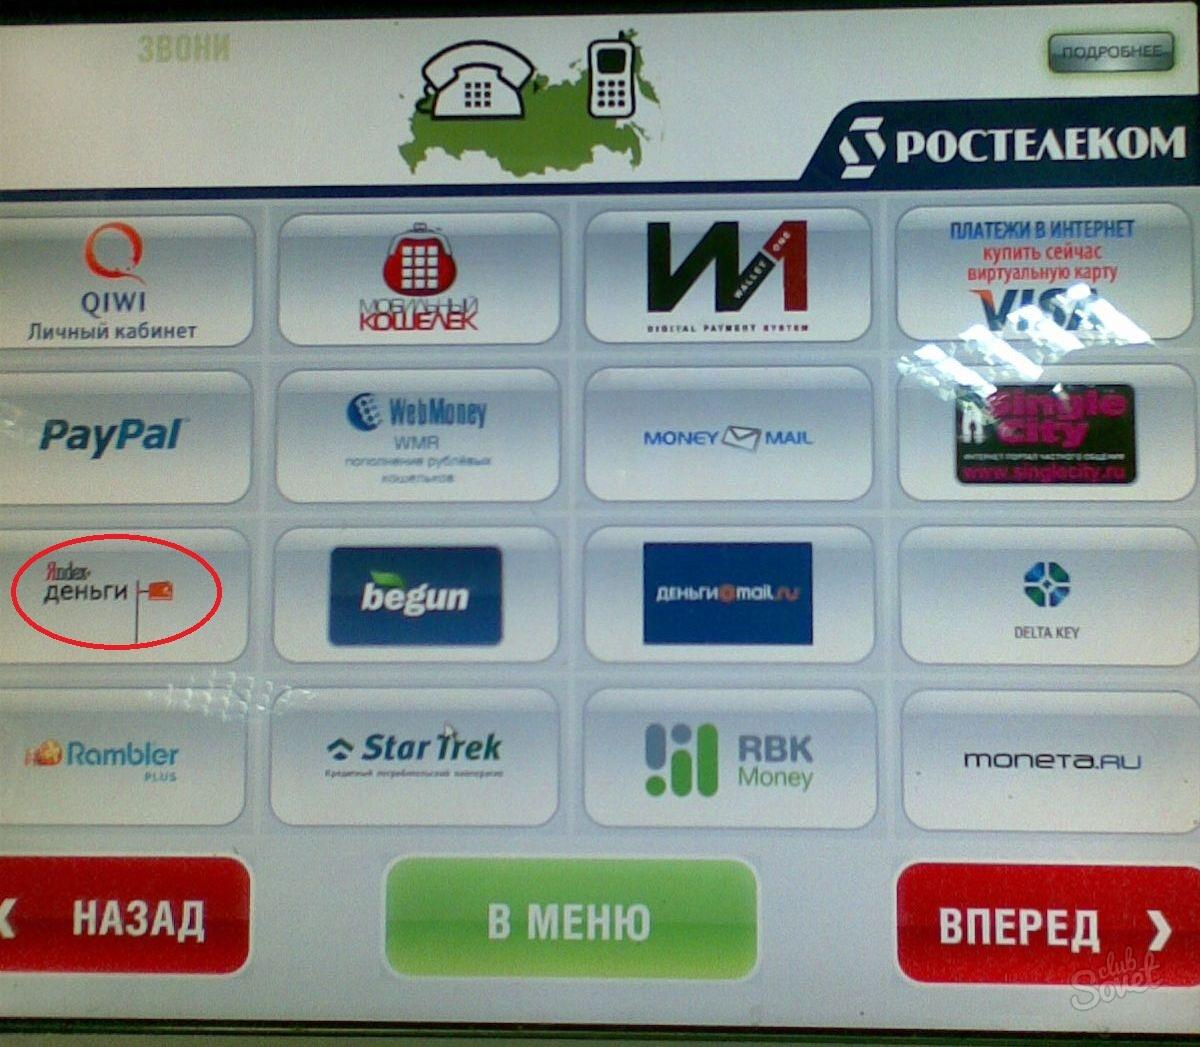 Yandex pul orqali oyinlar